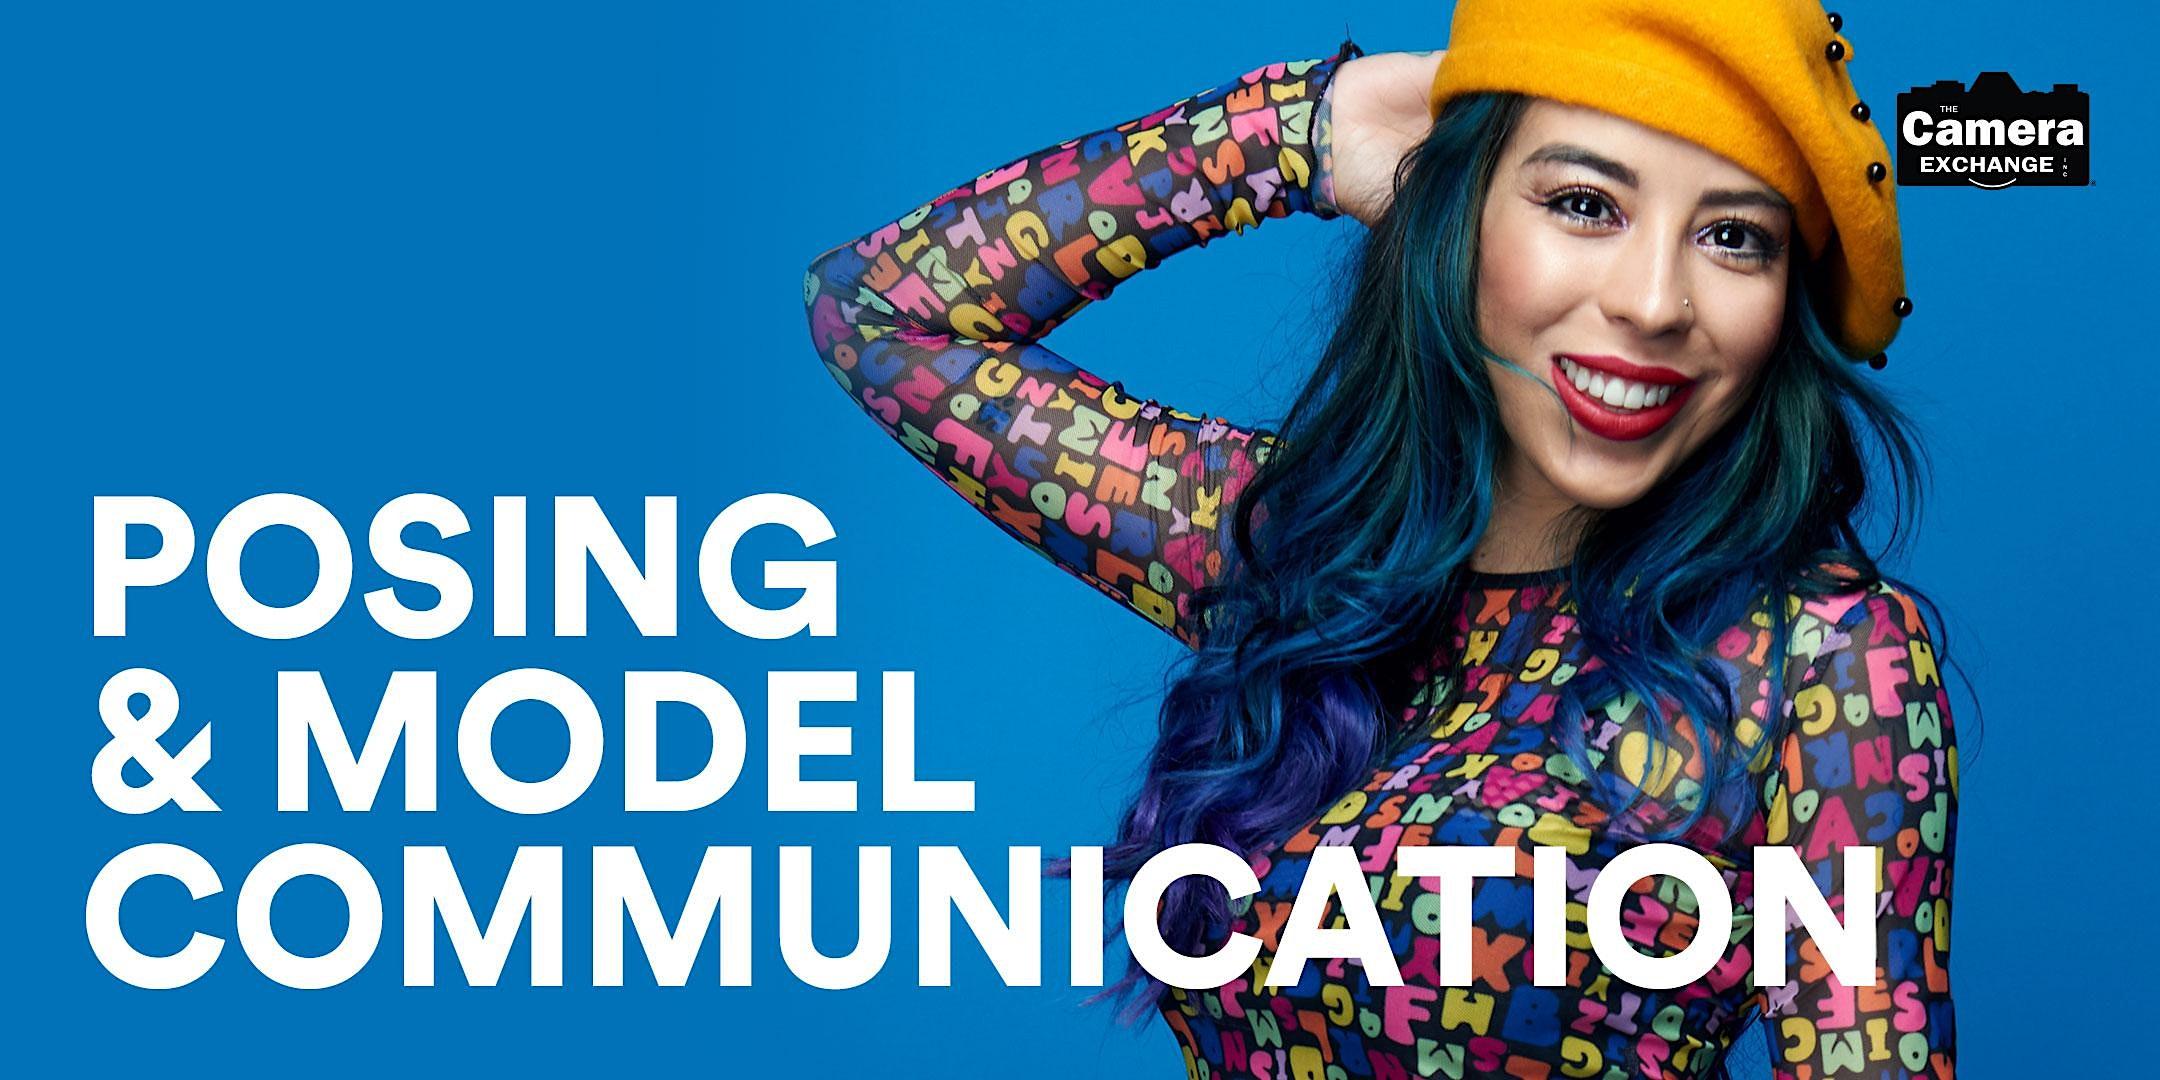 Posing & Model Communication